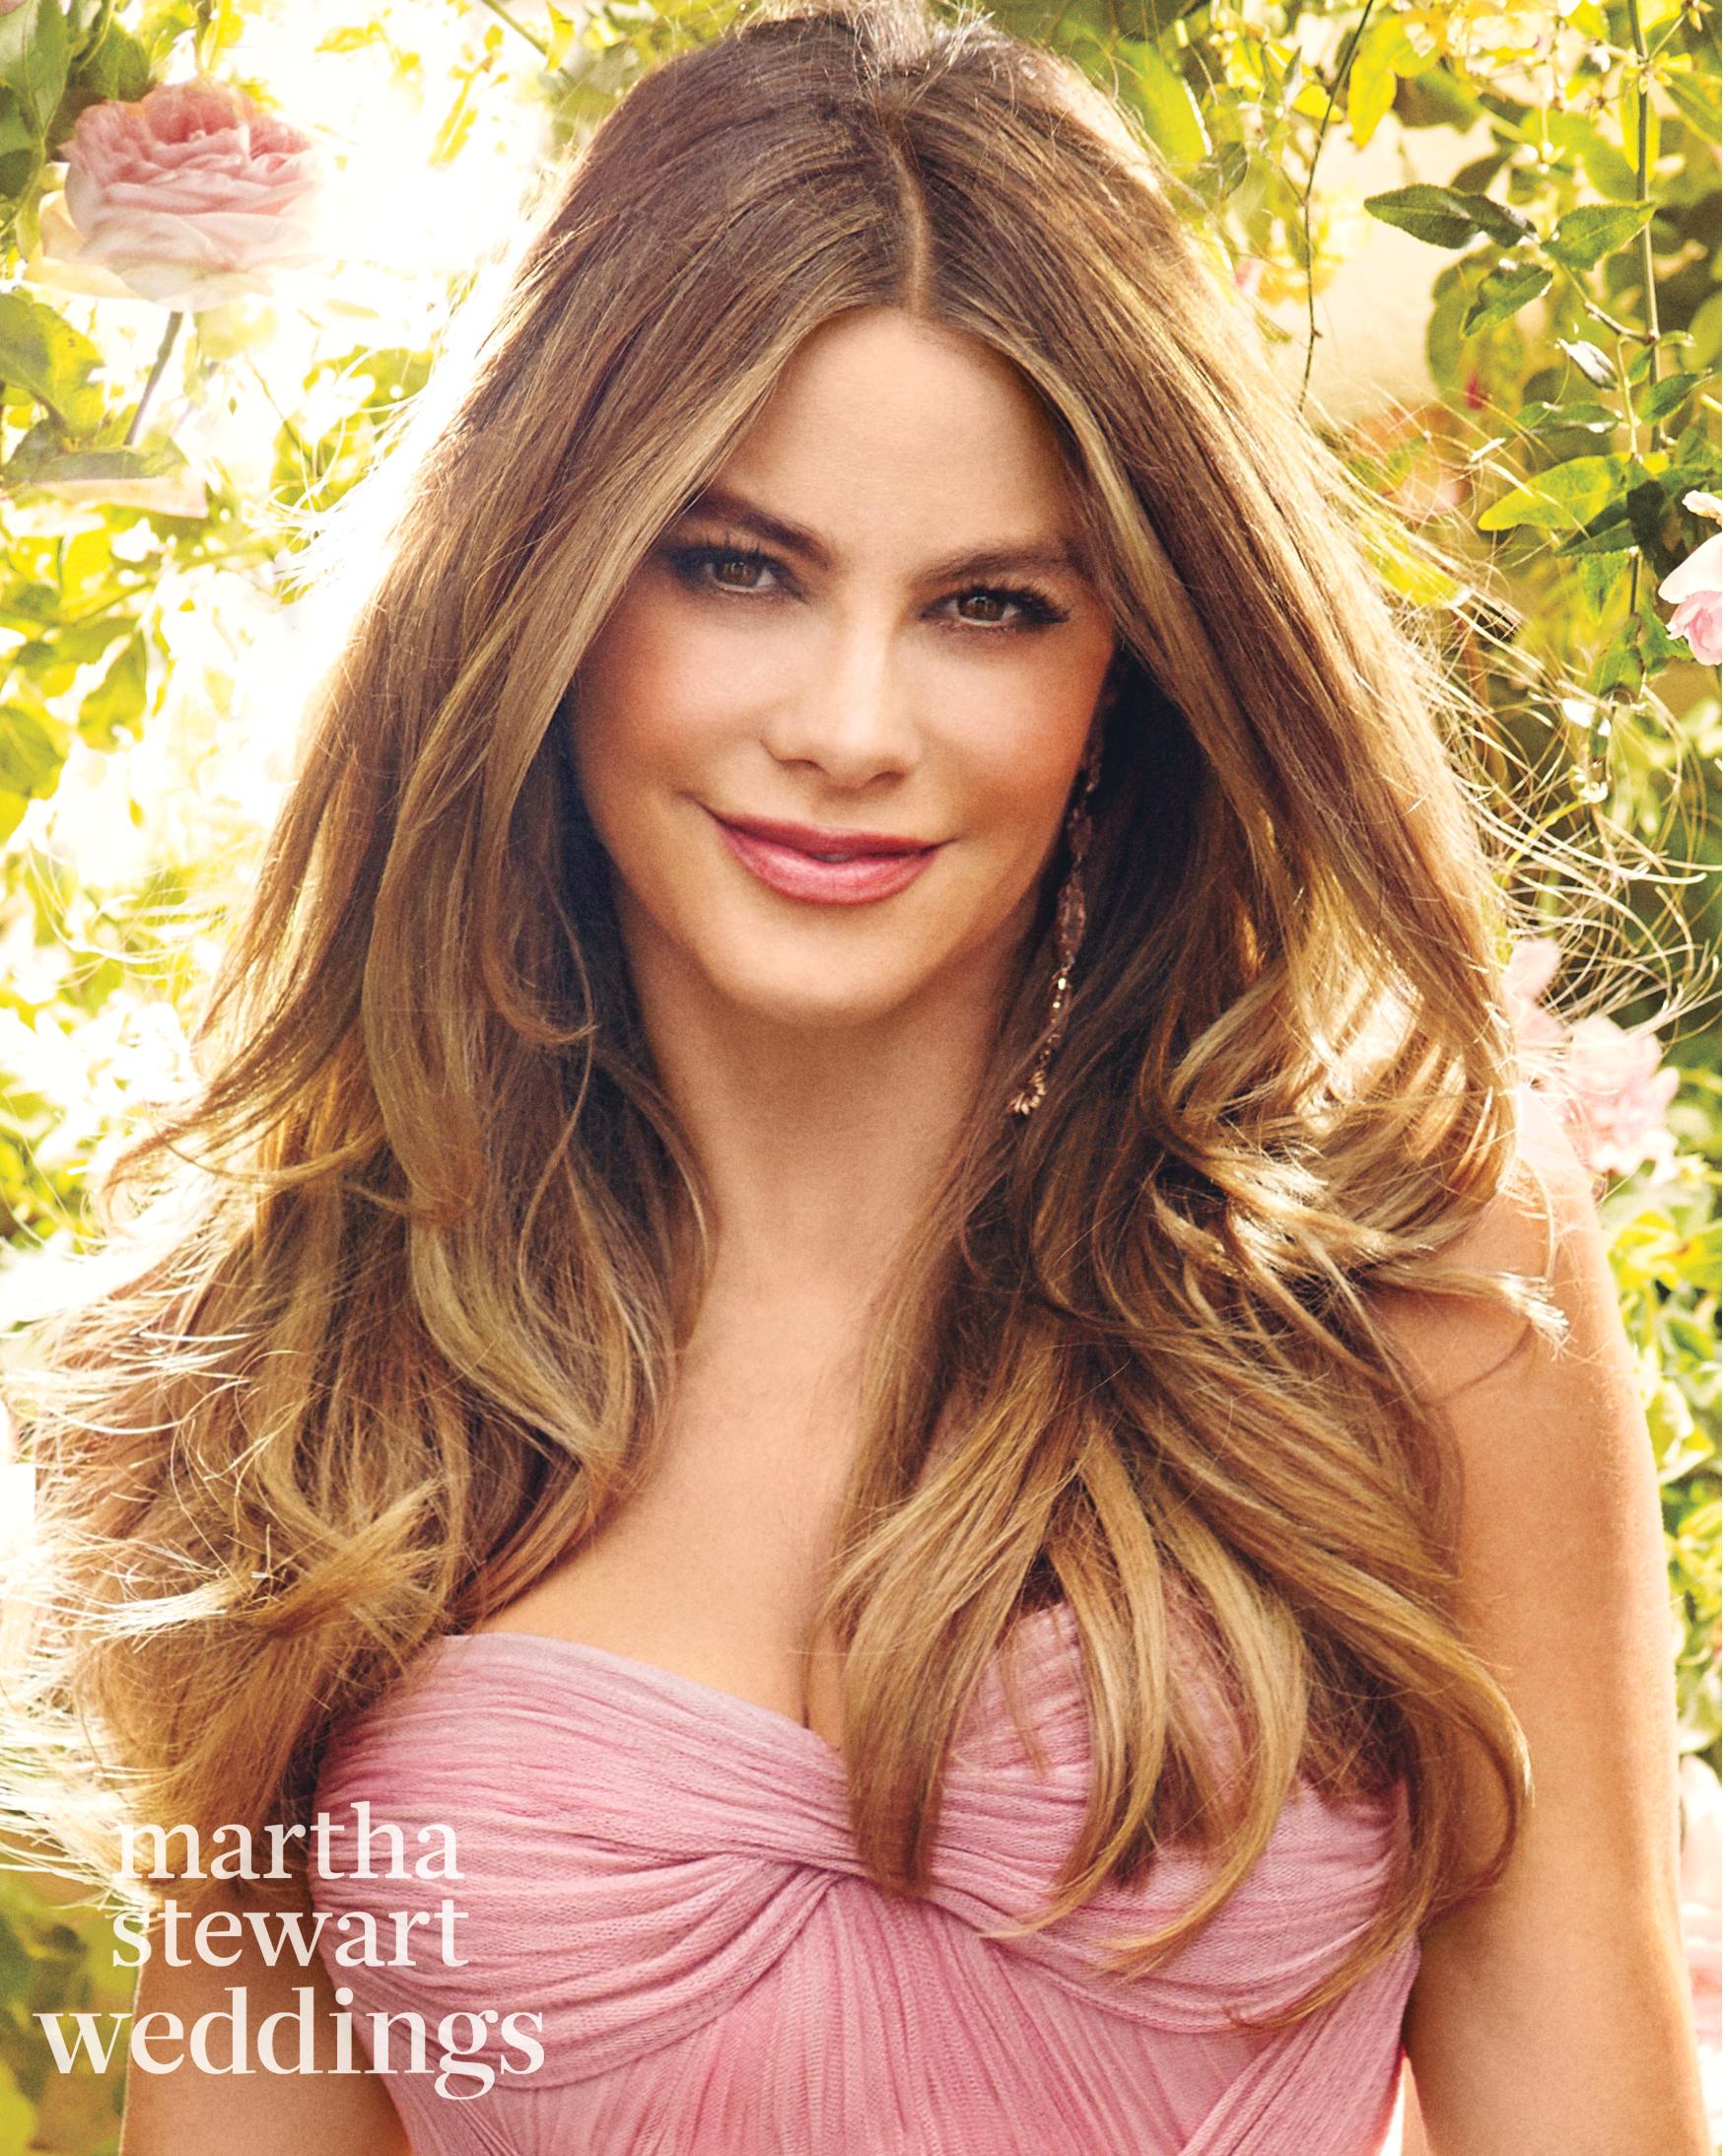 sofia-vergara-m02-pink-bridal-gown-012v2-d112252-beauty1-0815.jpg